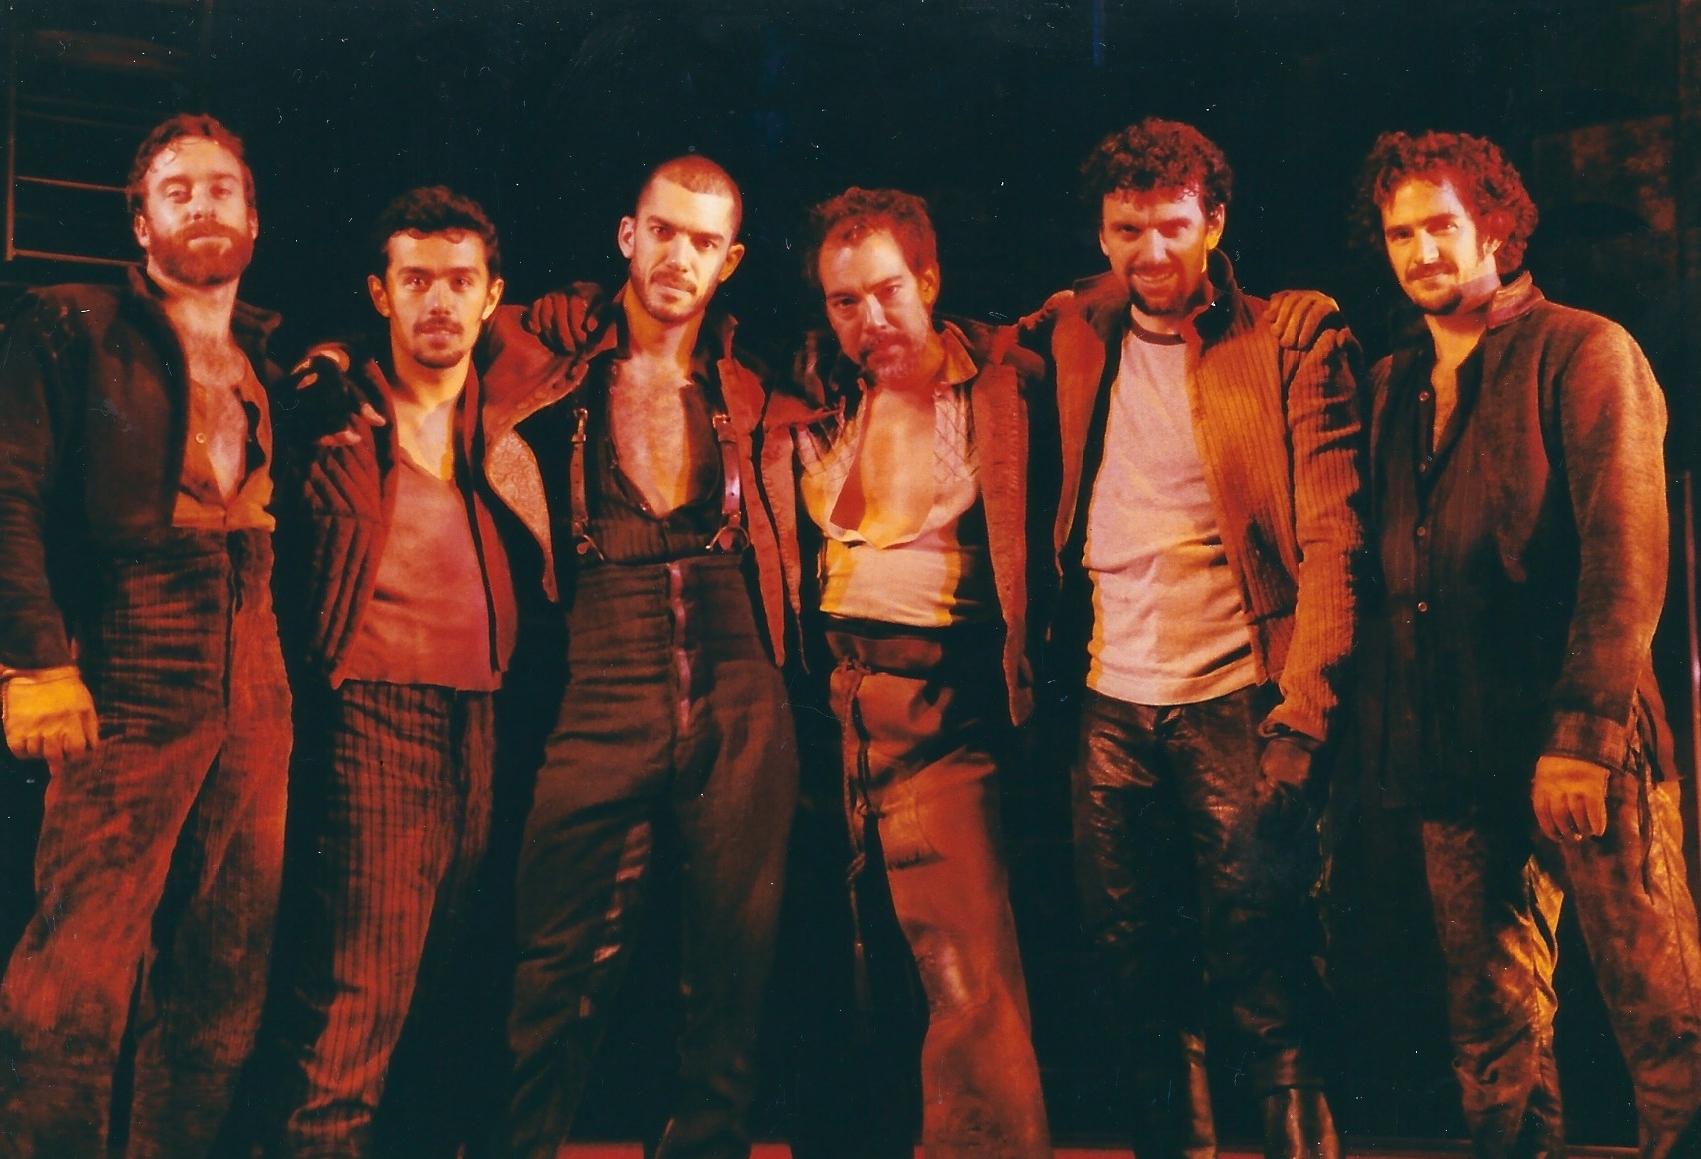 MAN OF LA MANCHA  (Broadway revival): Timothy J. Alex, Wilson Mendieta, Dennis Stowe, Thom Sesma, Bradley Dean, Andy Blankenbuehler